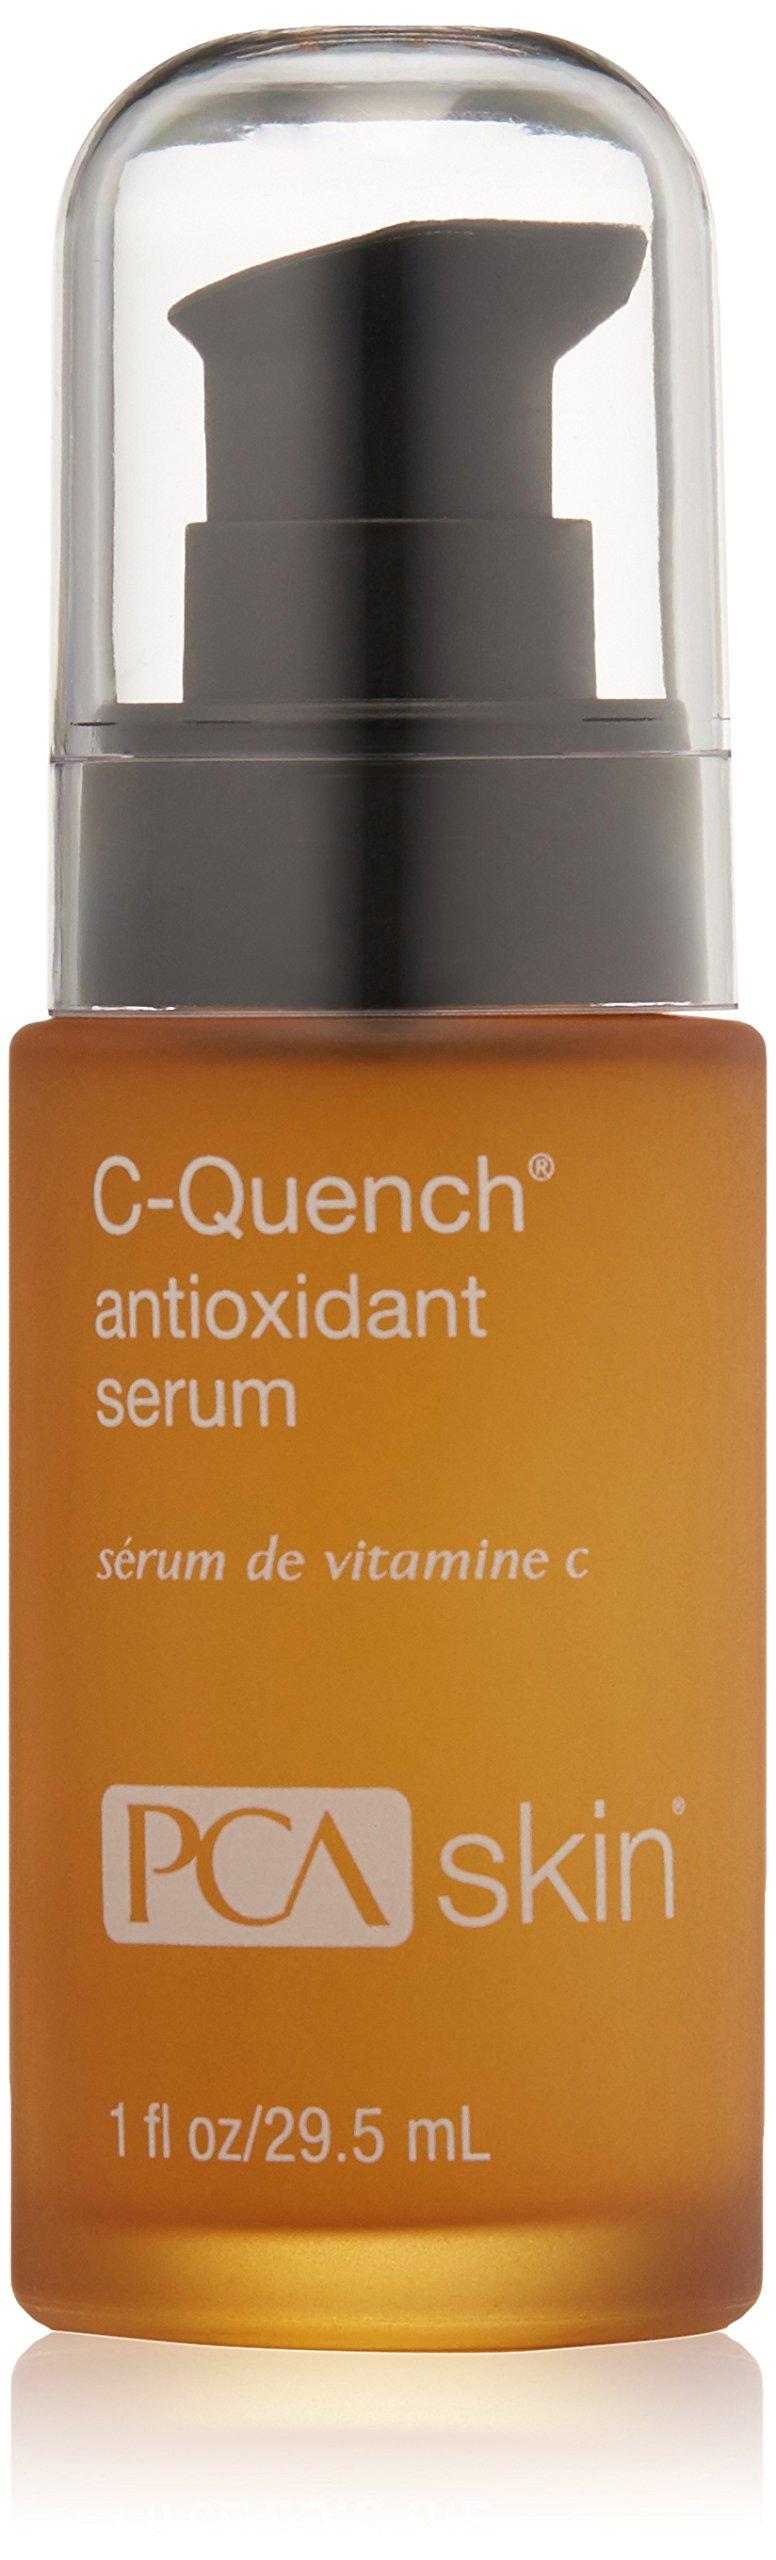 PCA SKIN C-Quench Antioxidant Serum, 1 fl. oz.